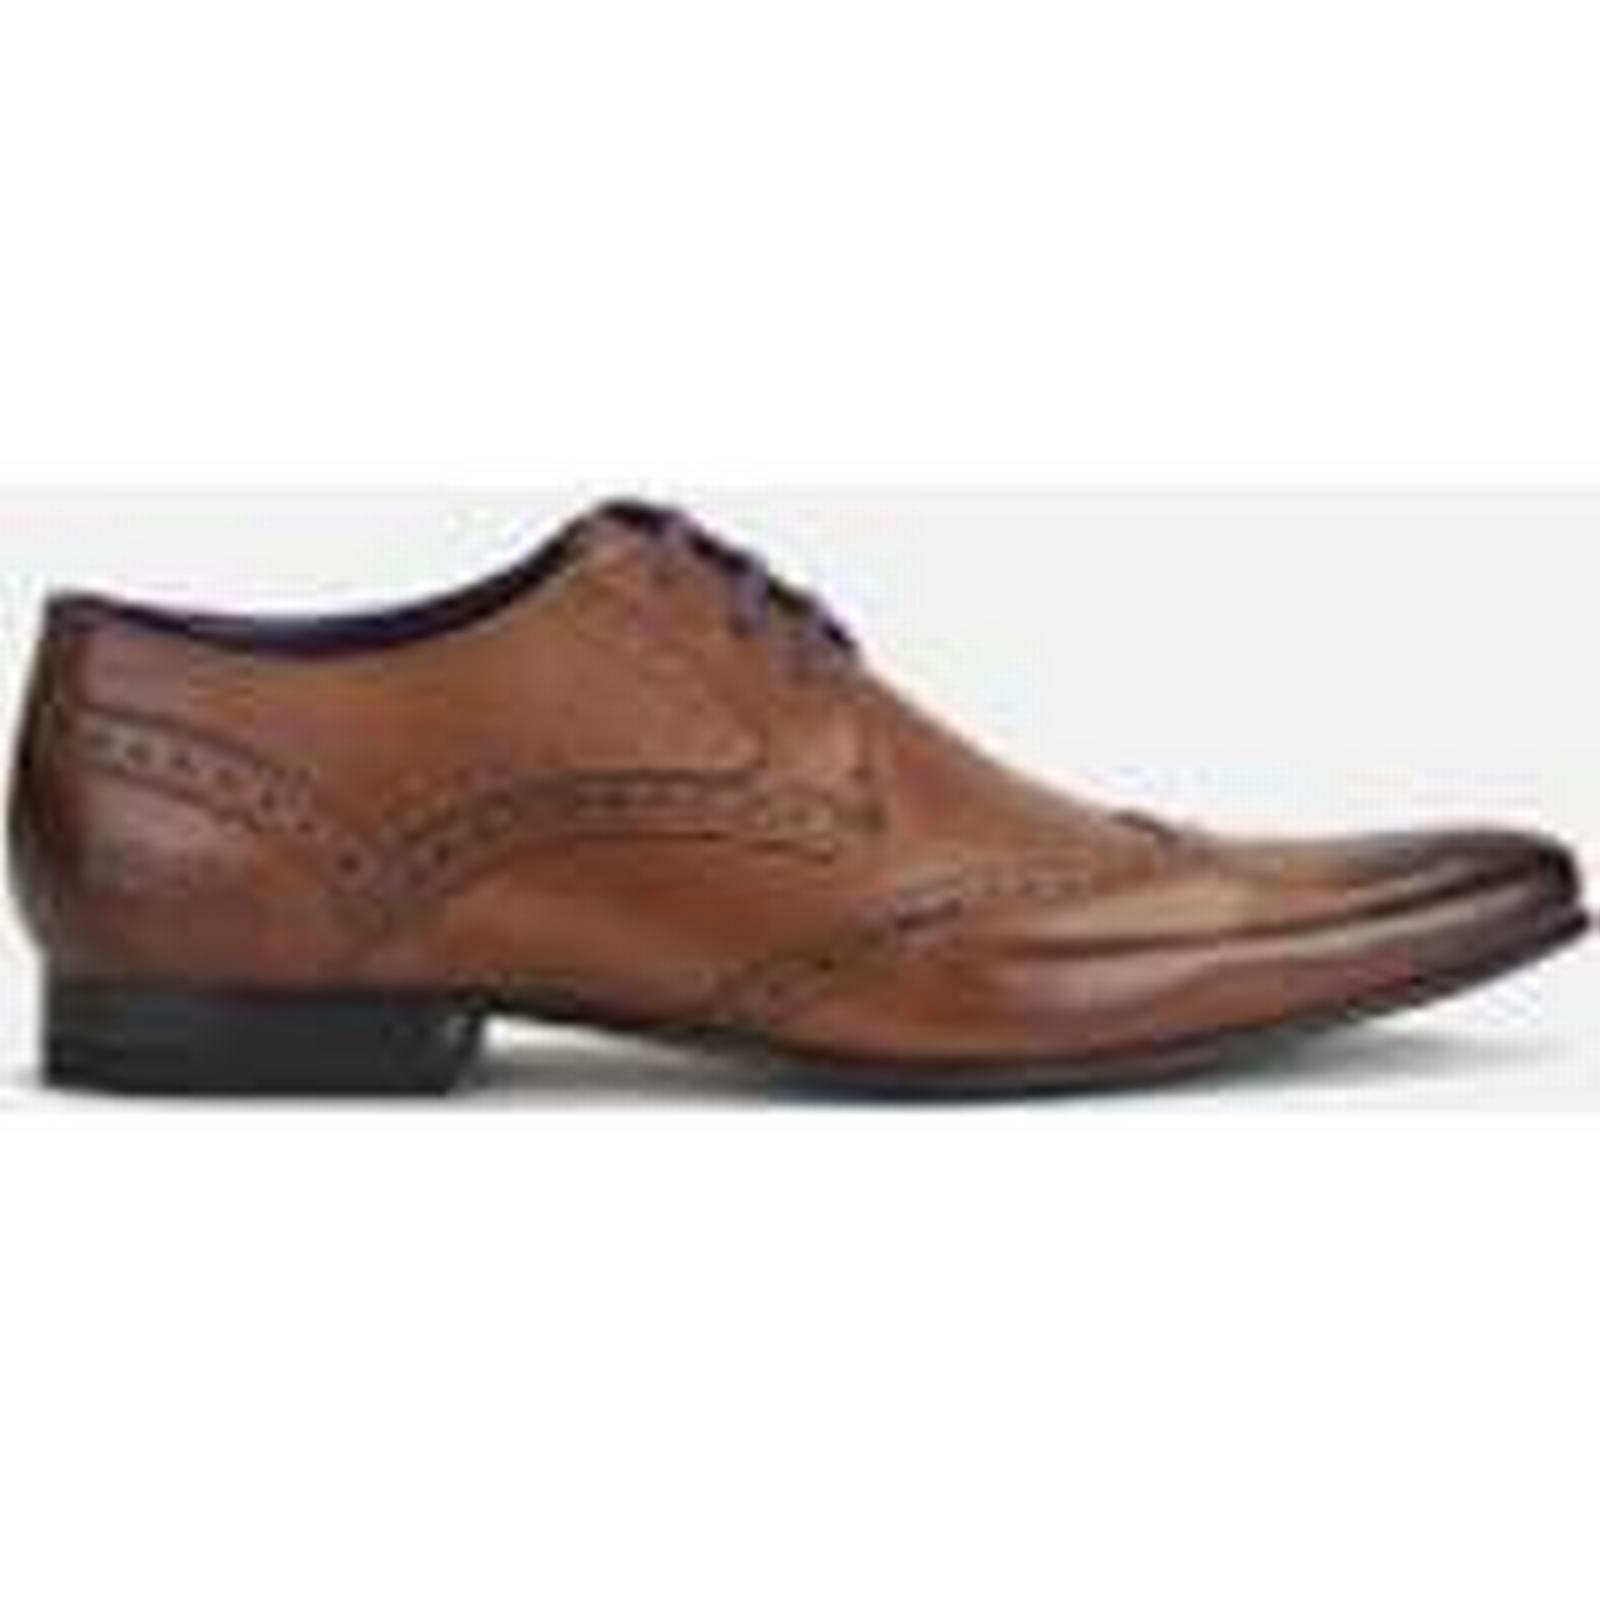 Ted Baker Men's Hann 2 Leather Brogues - - Tan - UK 8 - - Tan d666b7